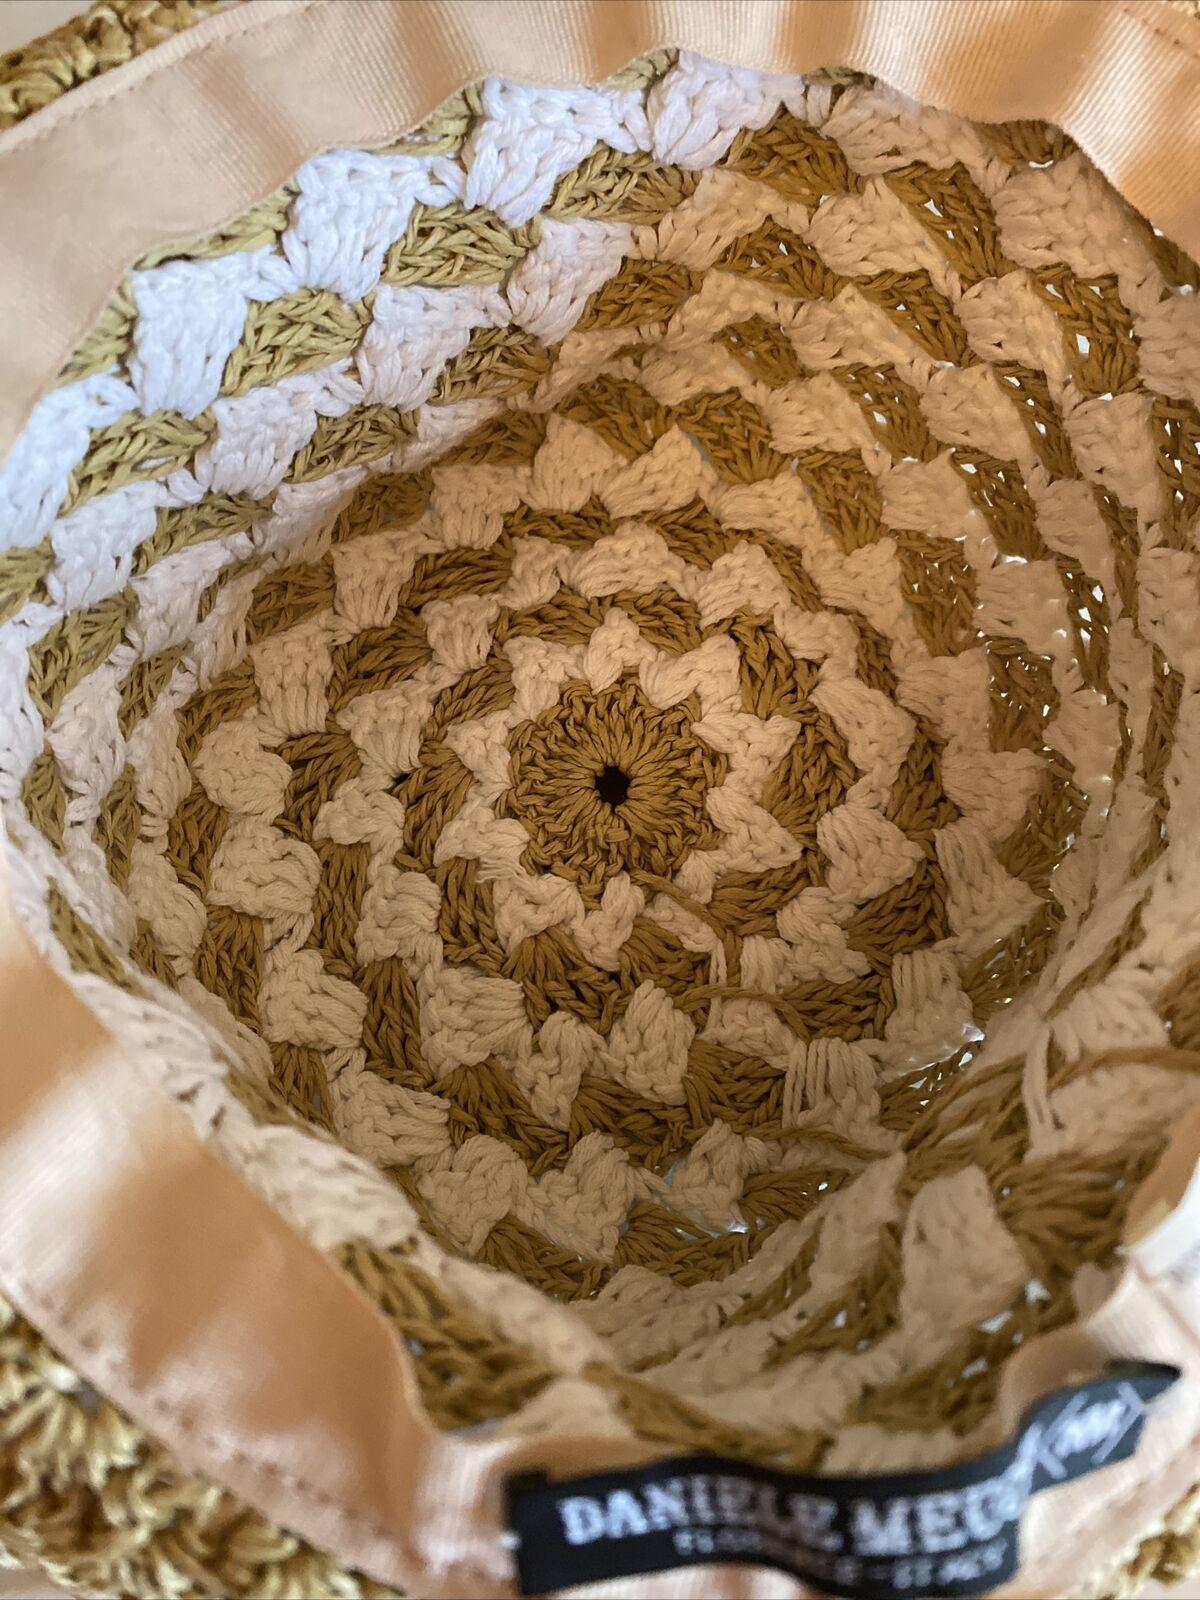 daniele meucci hat Paper Natural White Sun Hat - image 6